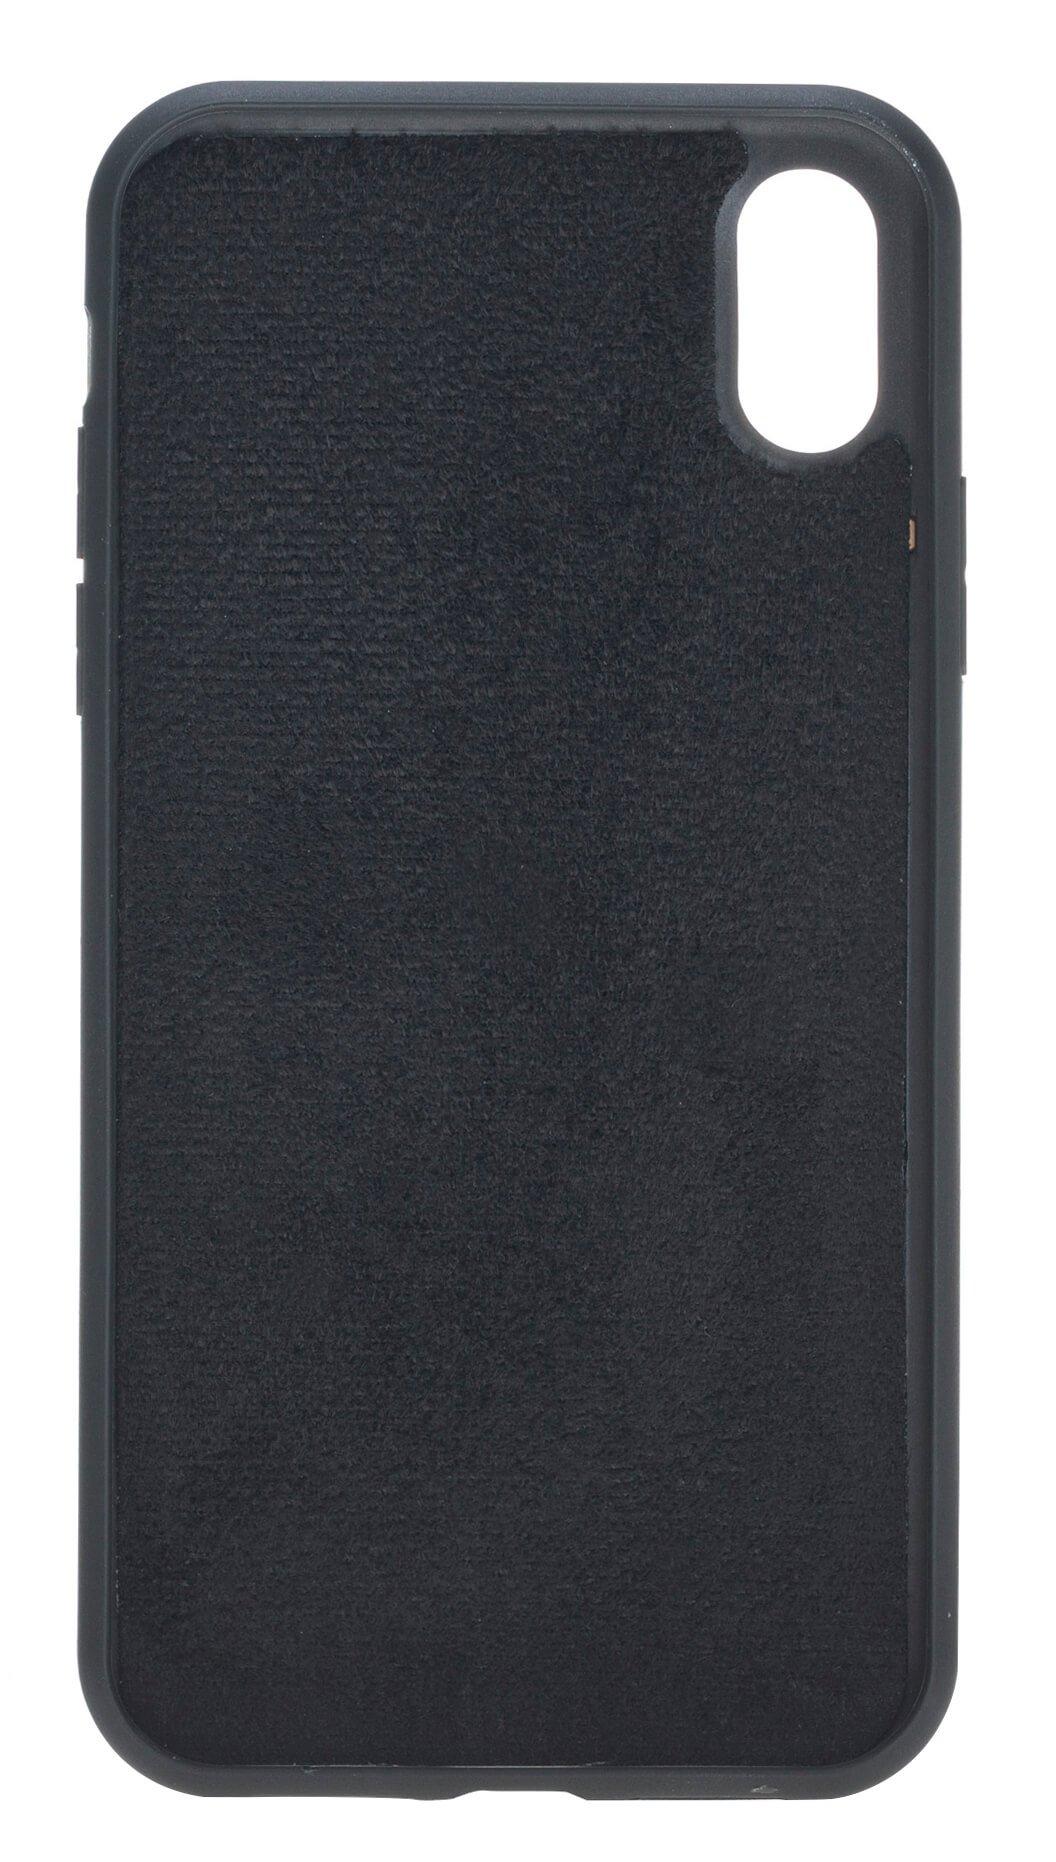 iPhone XR 6.1 Zoll Abnehmbare Lederhülle (2in1) in Krokoprägung Schwarz